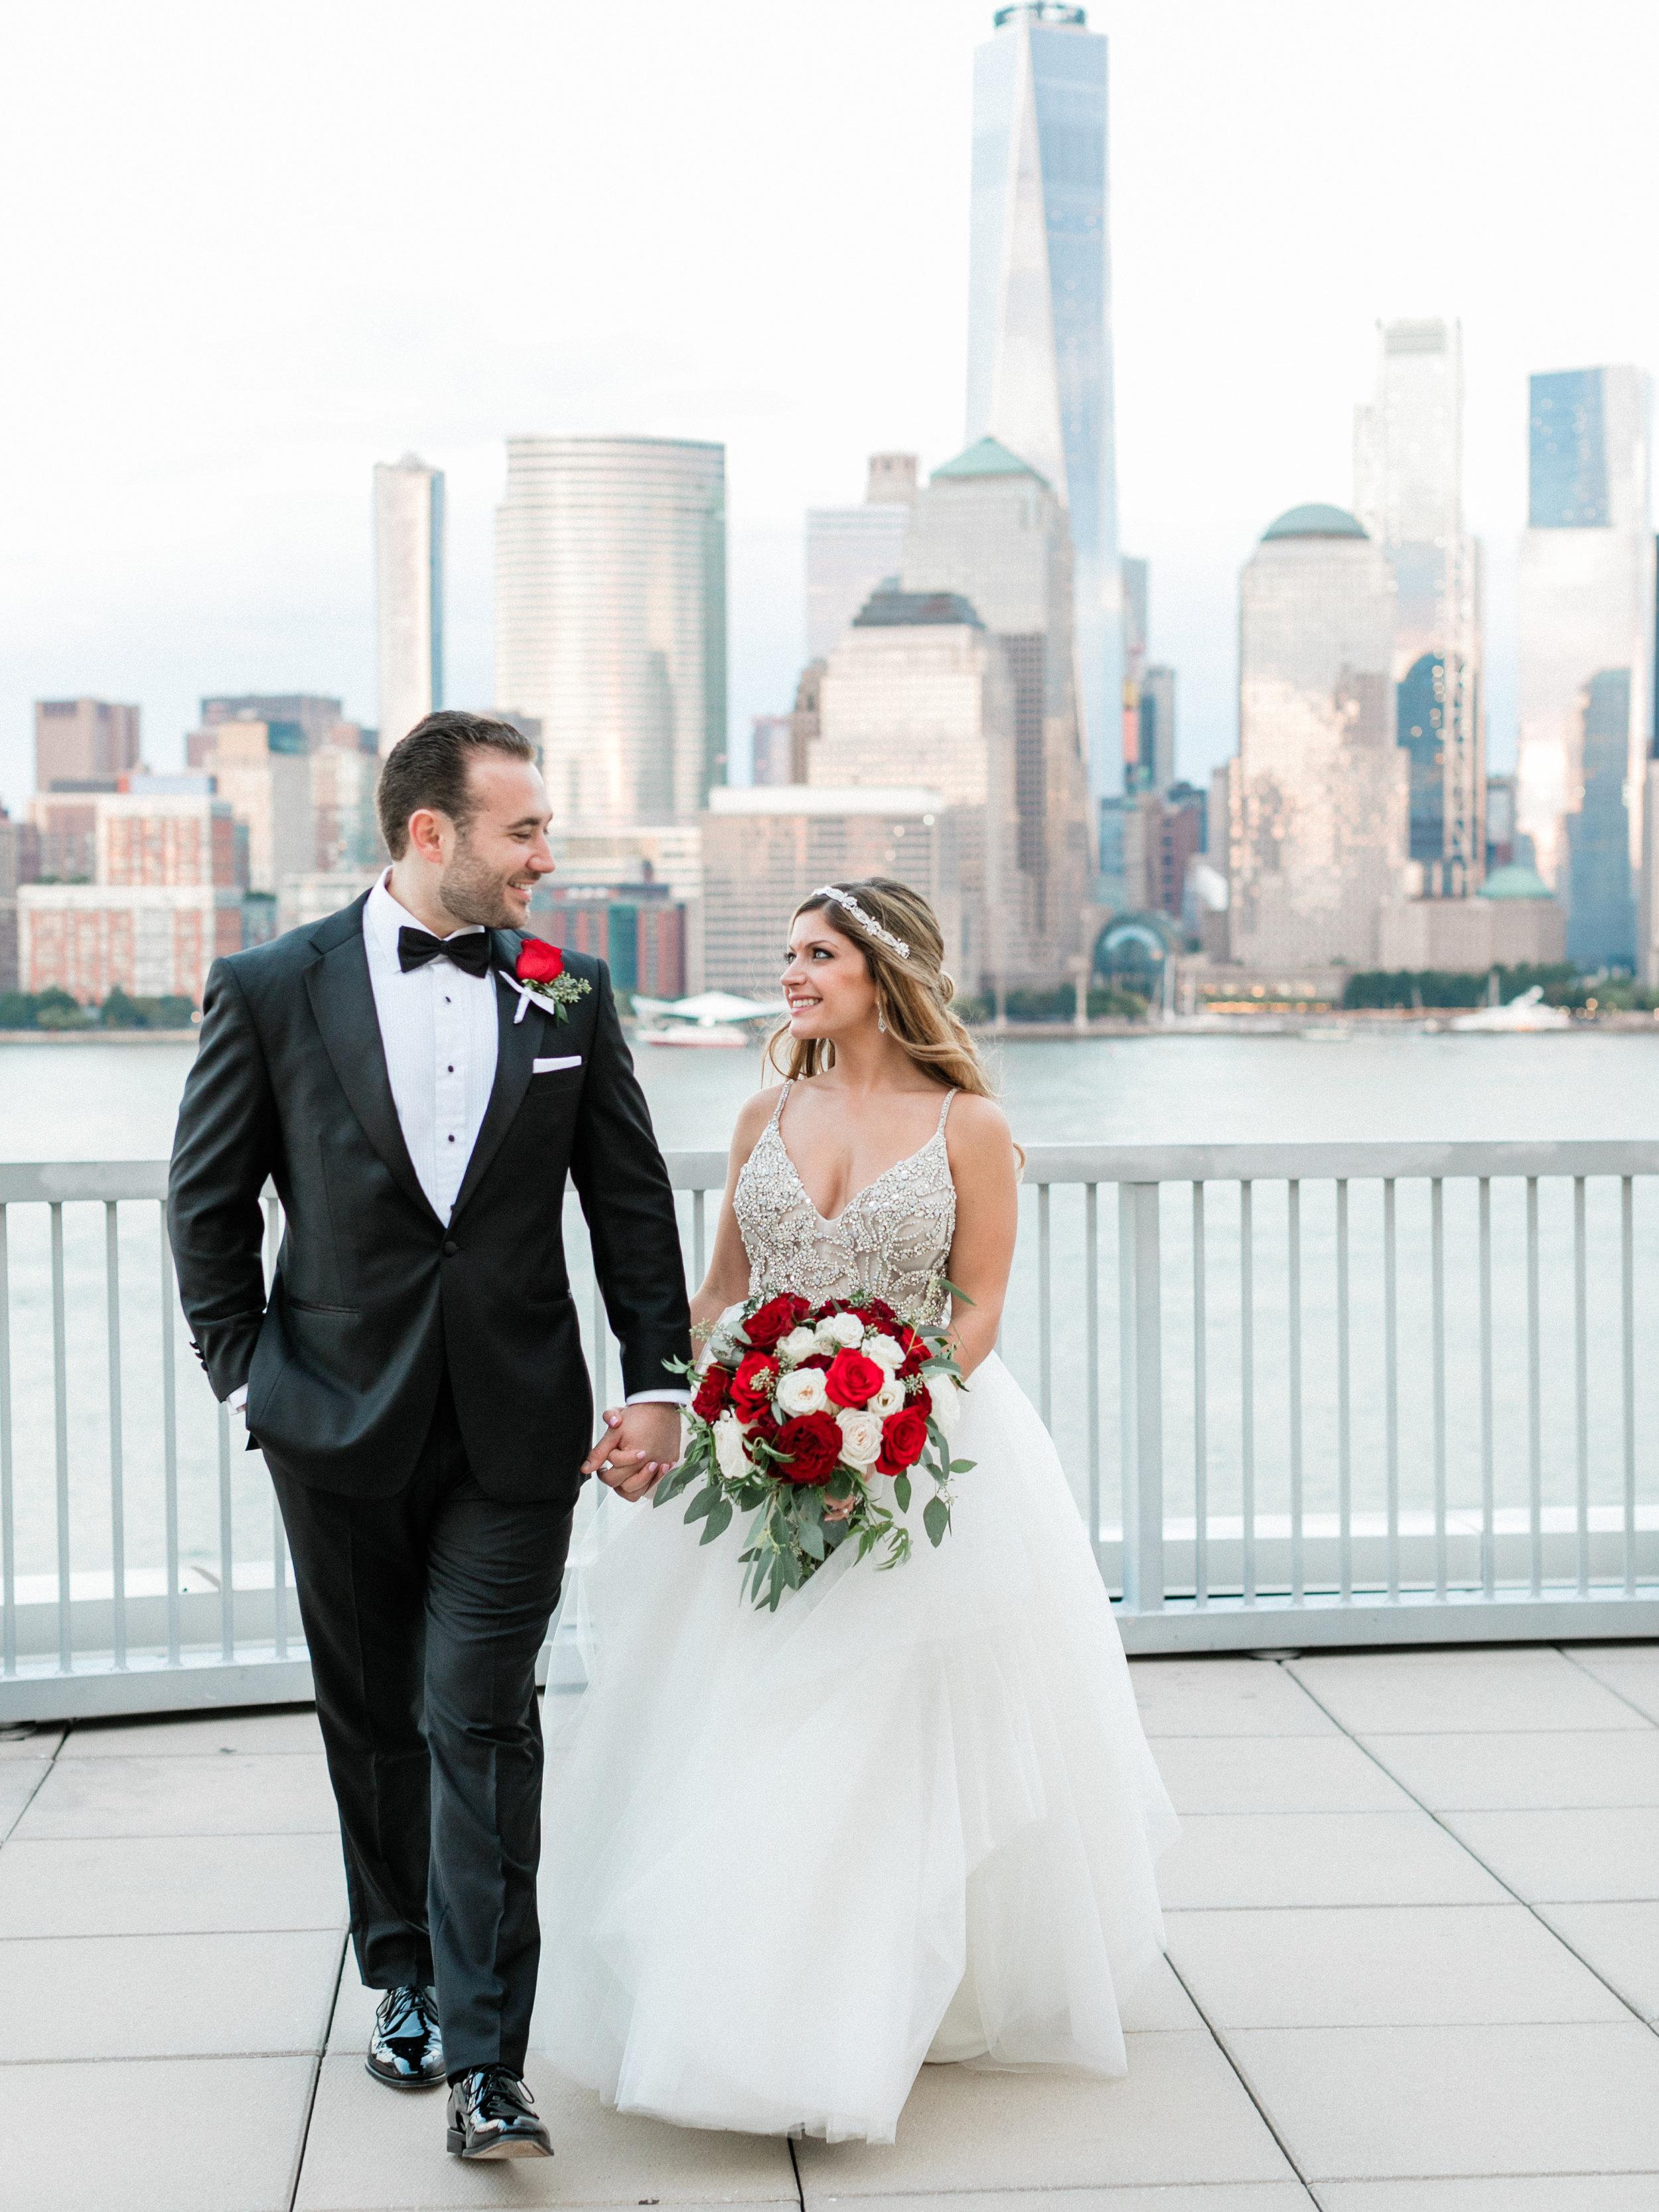 hyatt-regency-jersey-city-wedding-photographer65.jpg